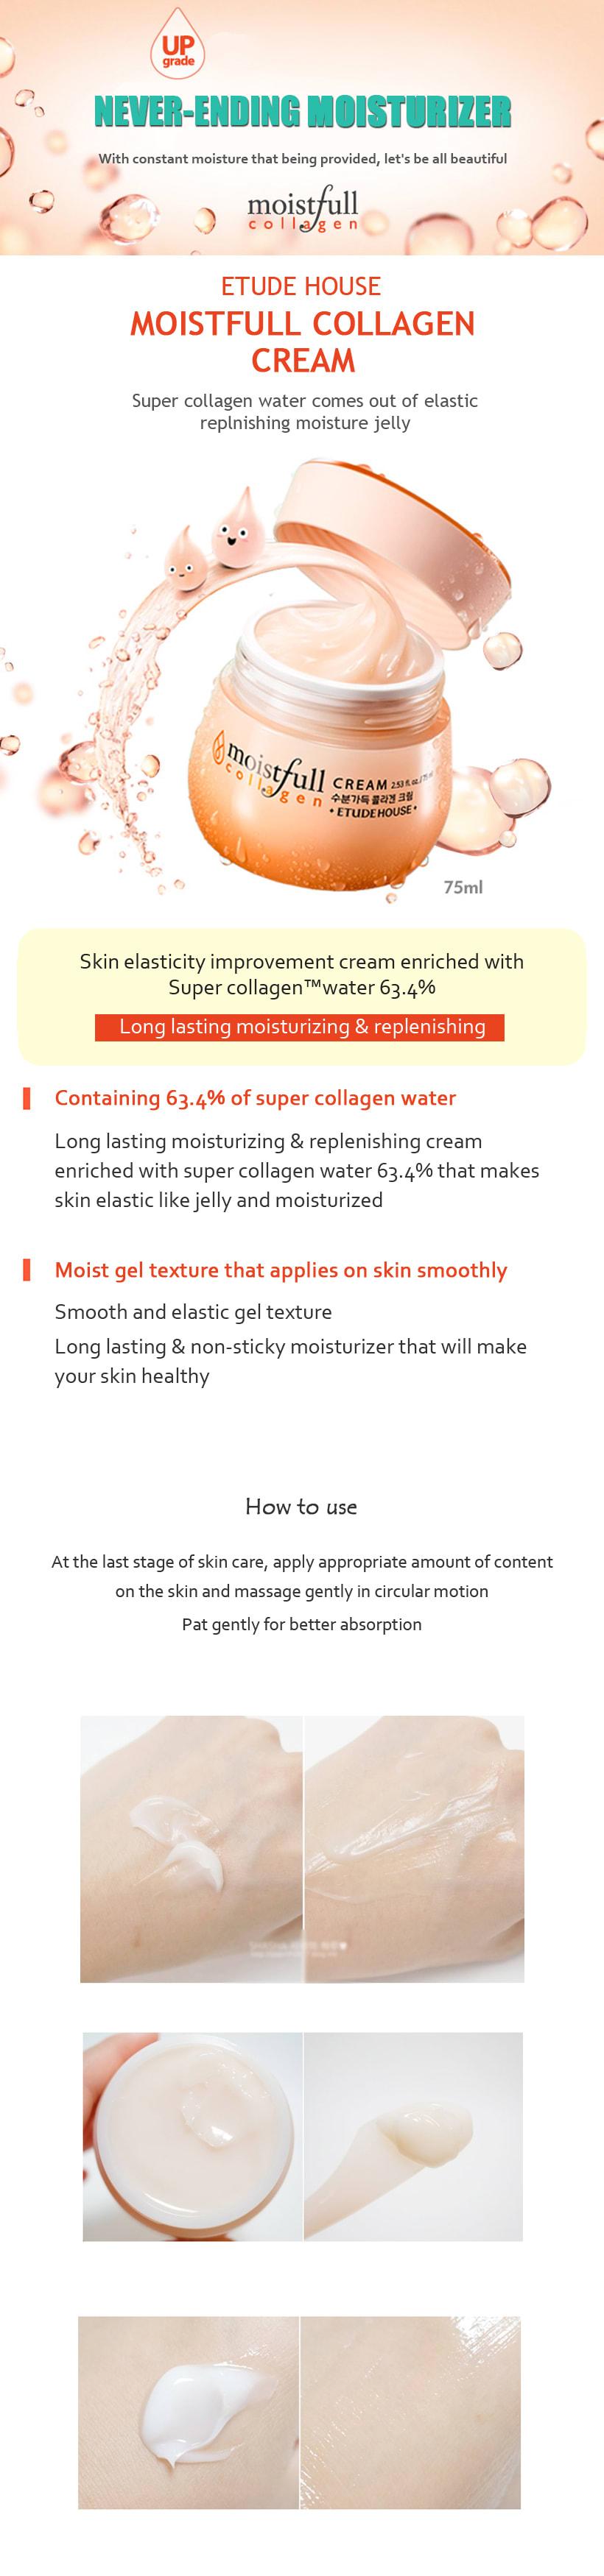 Moistfull Collagen Cream 75ml How to use Description Ingredients